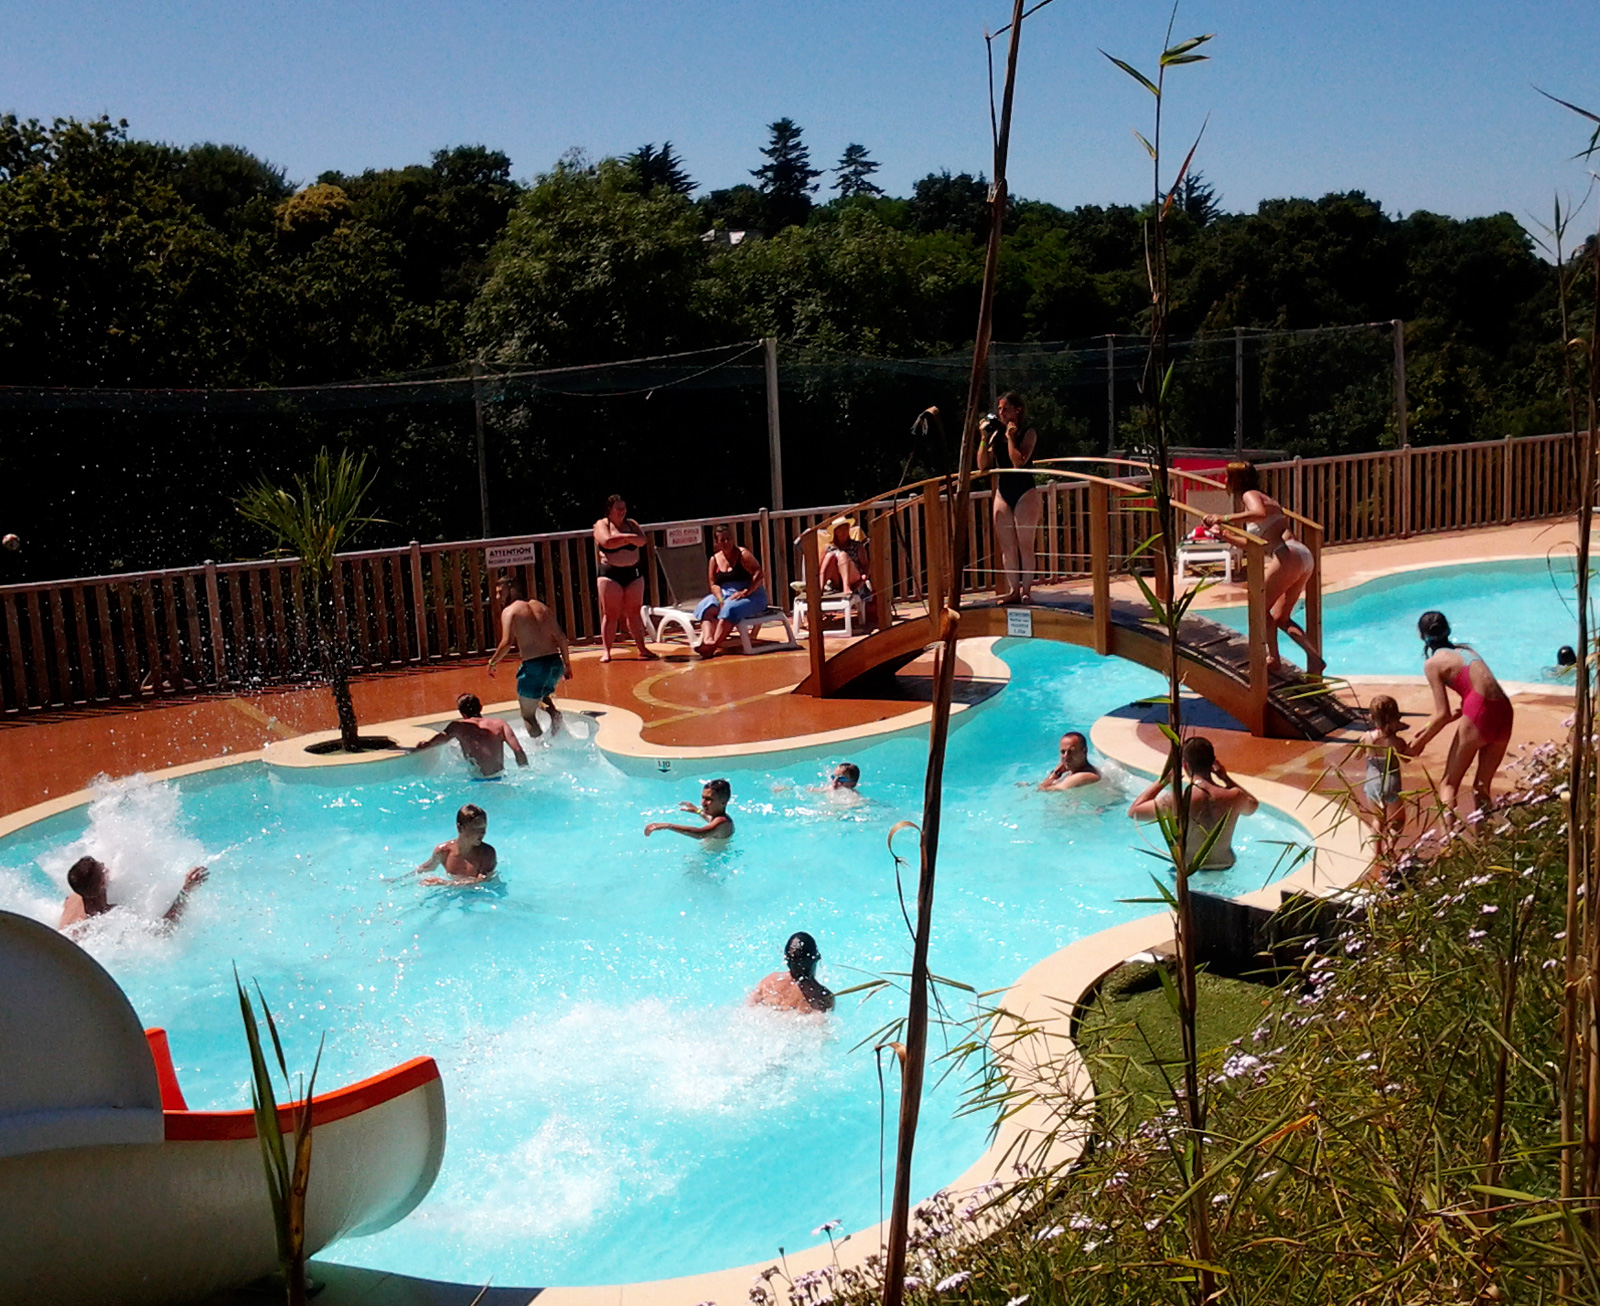 Camping en bretagne avec piscine couverte camping c tes for Camping guerande avec piscine